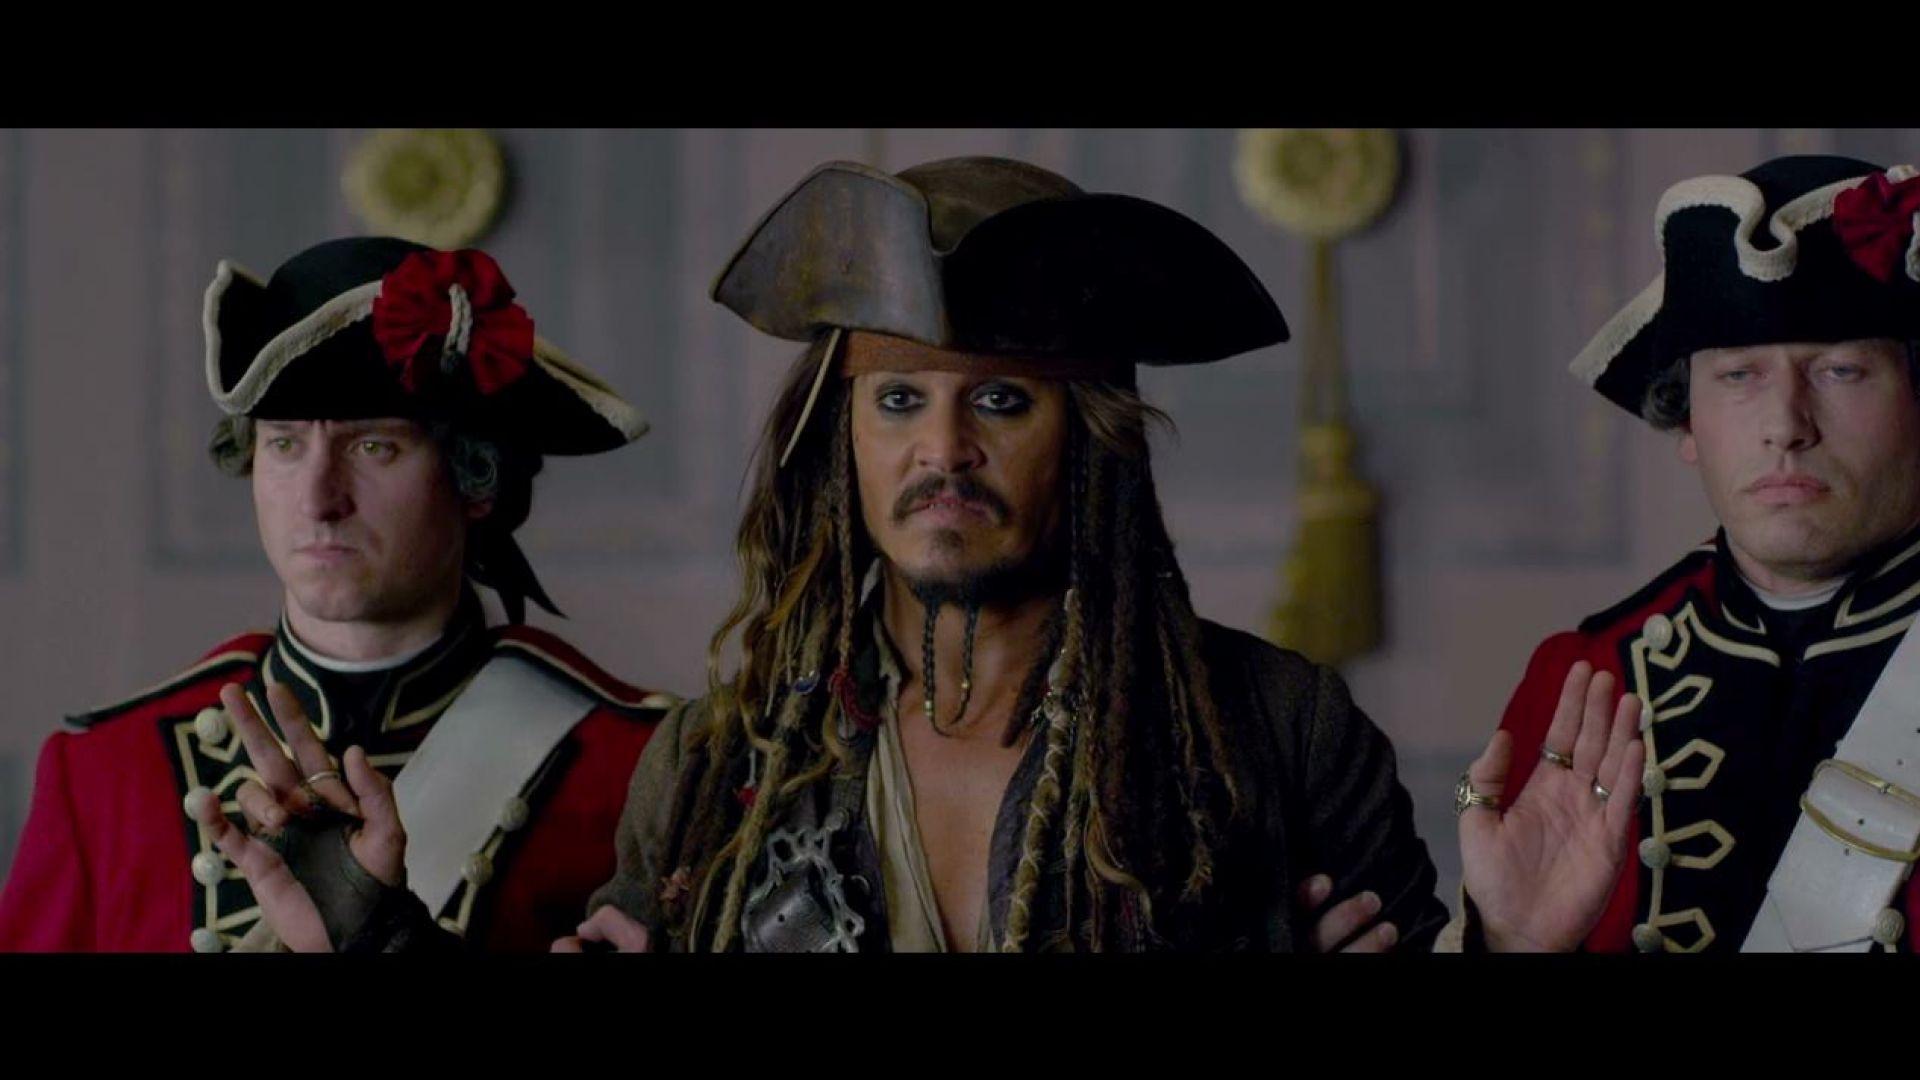 Jack Sparrow Escapes Barbossa's Palace, Pirates 4